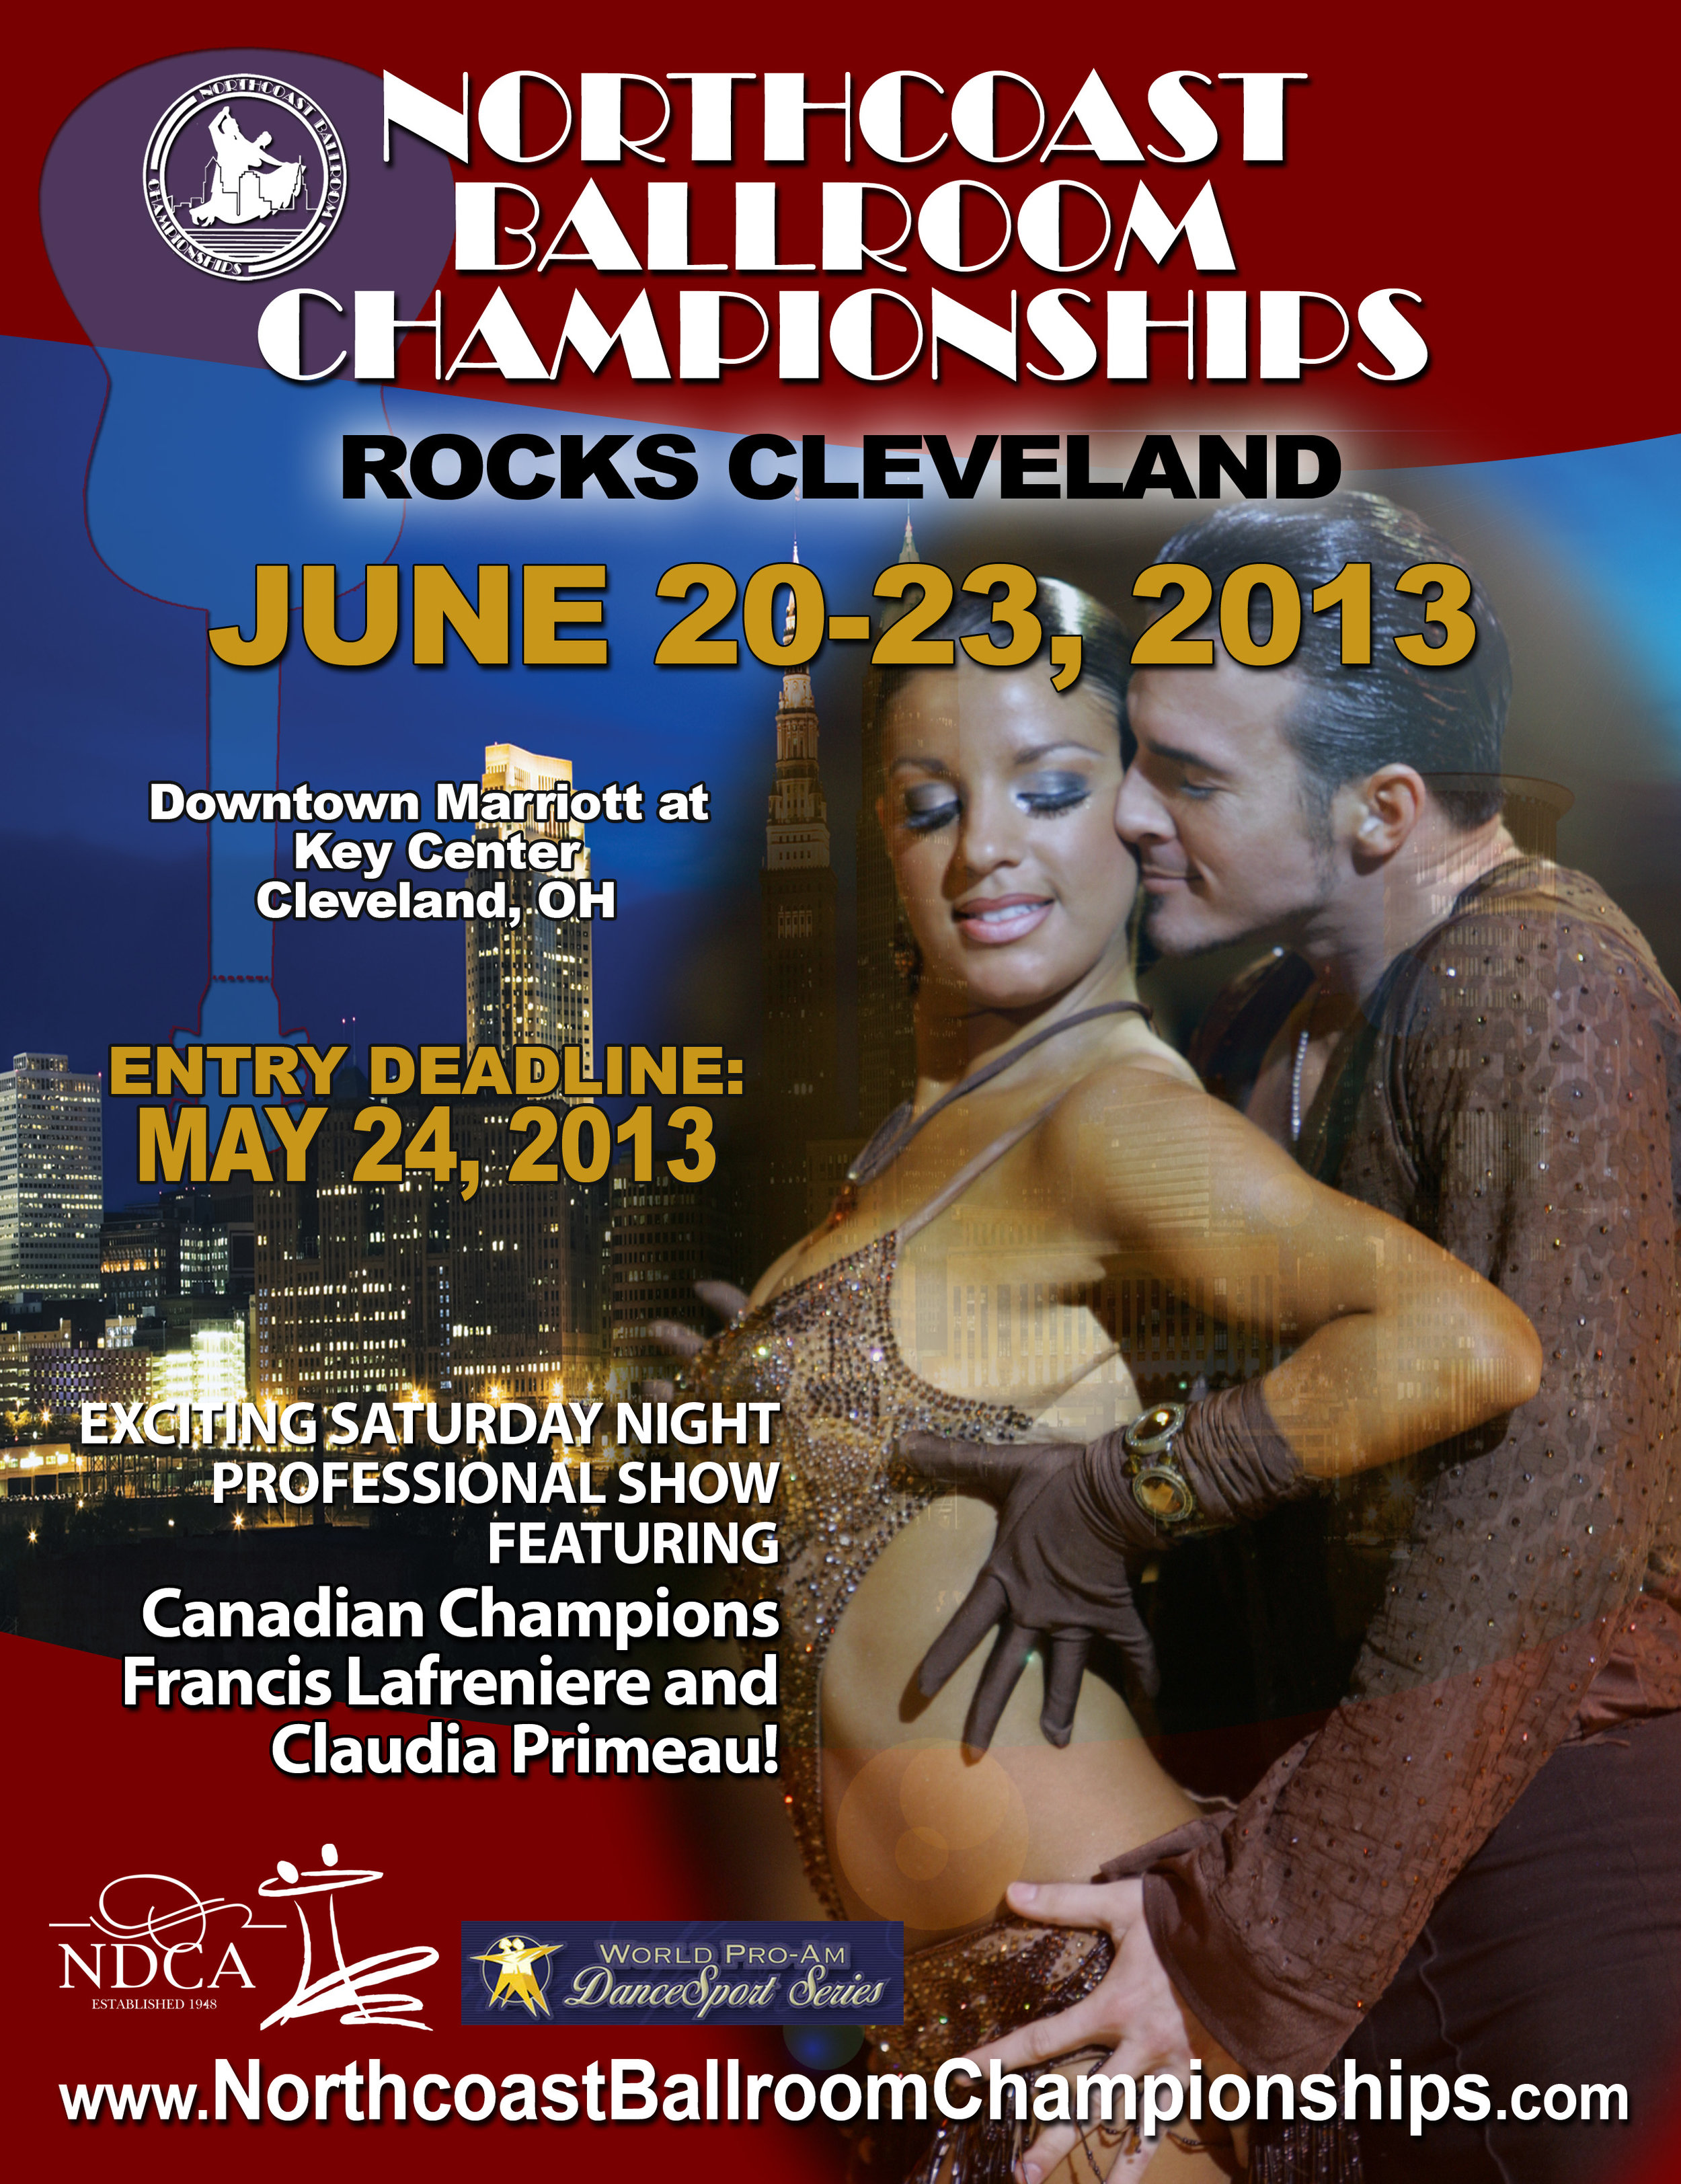 Packet Cover - Northcoast Ballroom Championships 2013 FINAL pg1.jpg